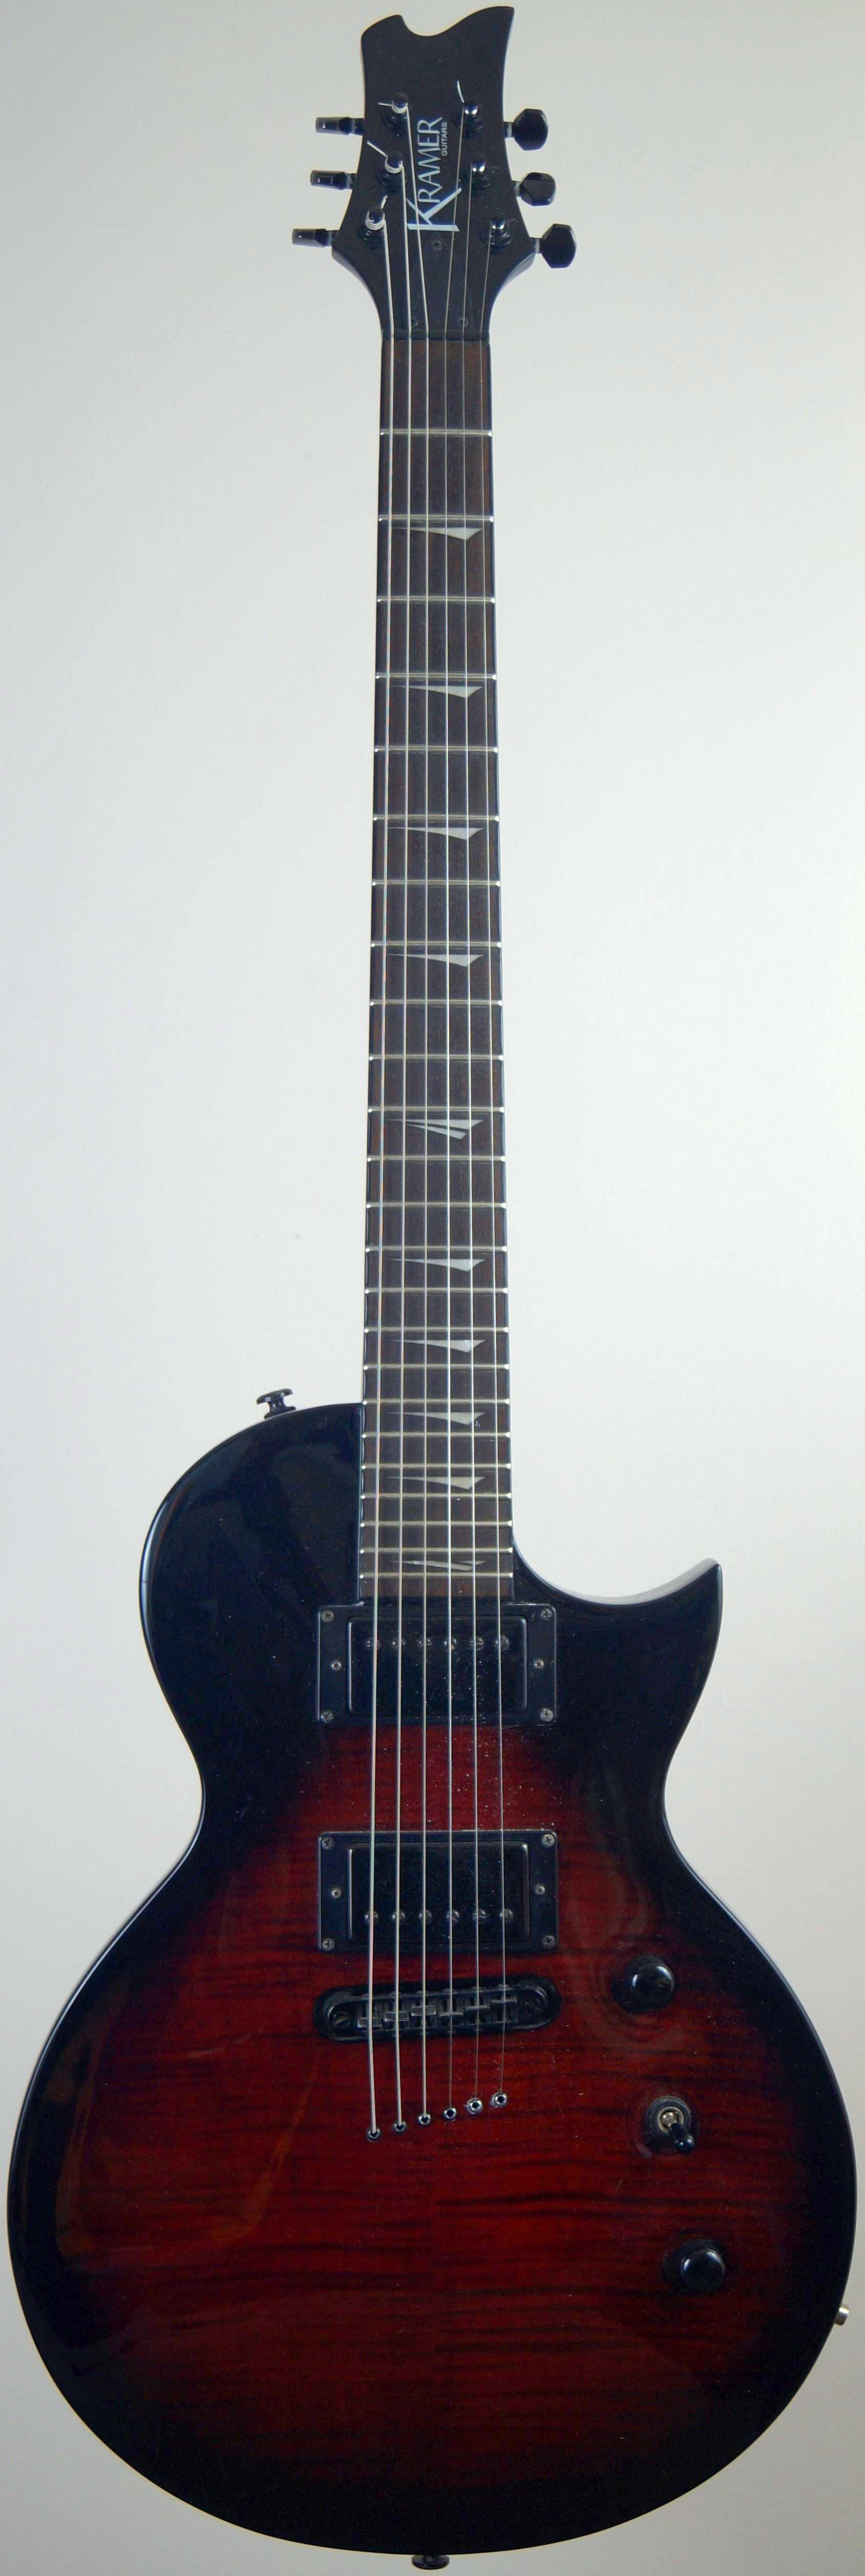 "My ""darkburst"" Kramer Assault 220 at Ukulele Corner incorporating the Pony Guitar Sanctuary"